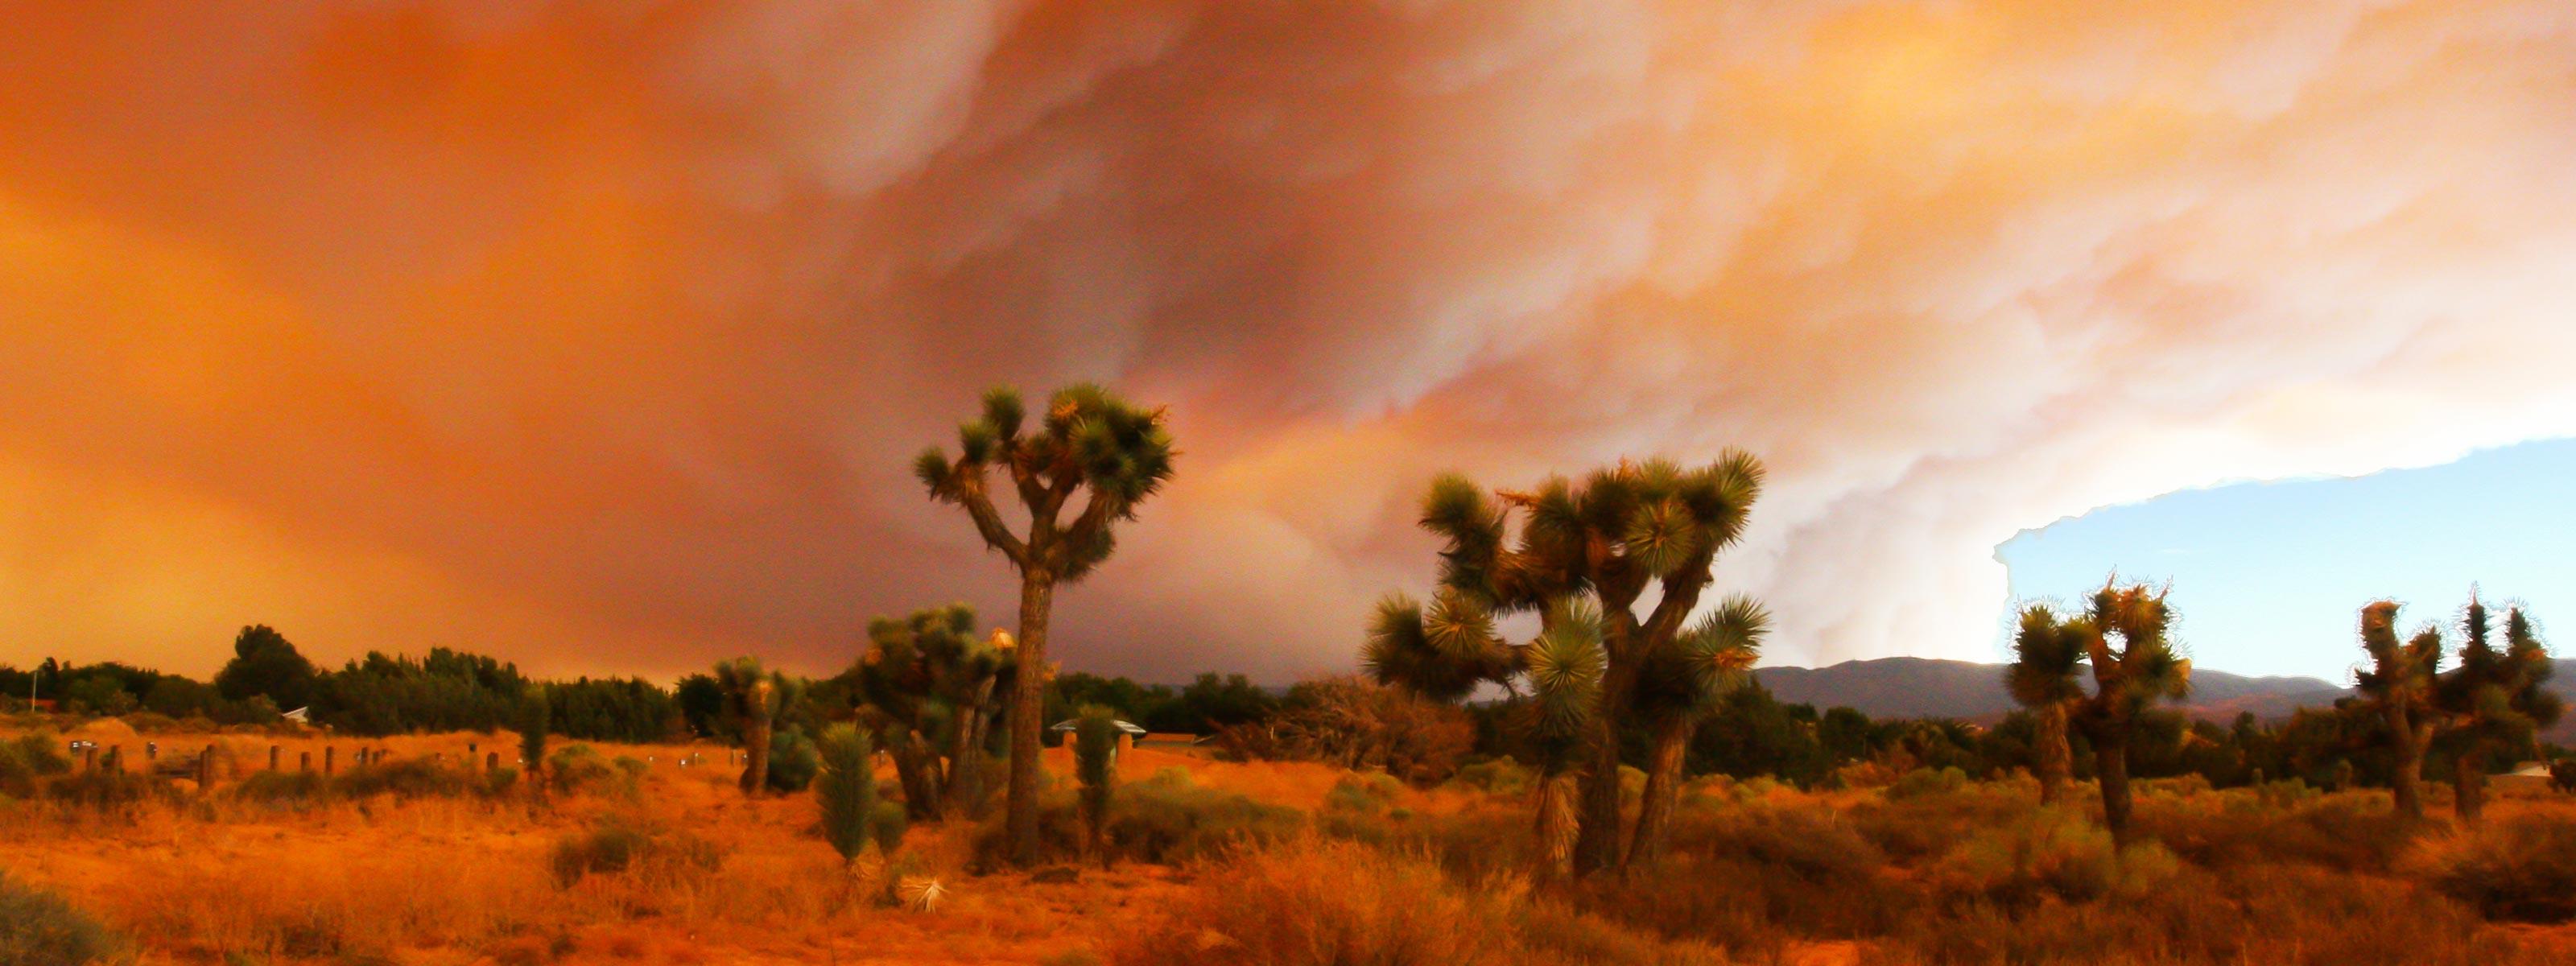 Firefighting satellites help track wildfires in California